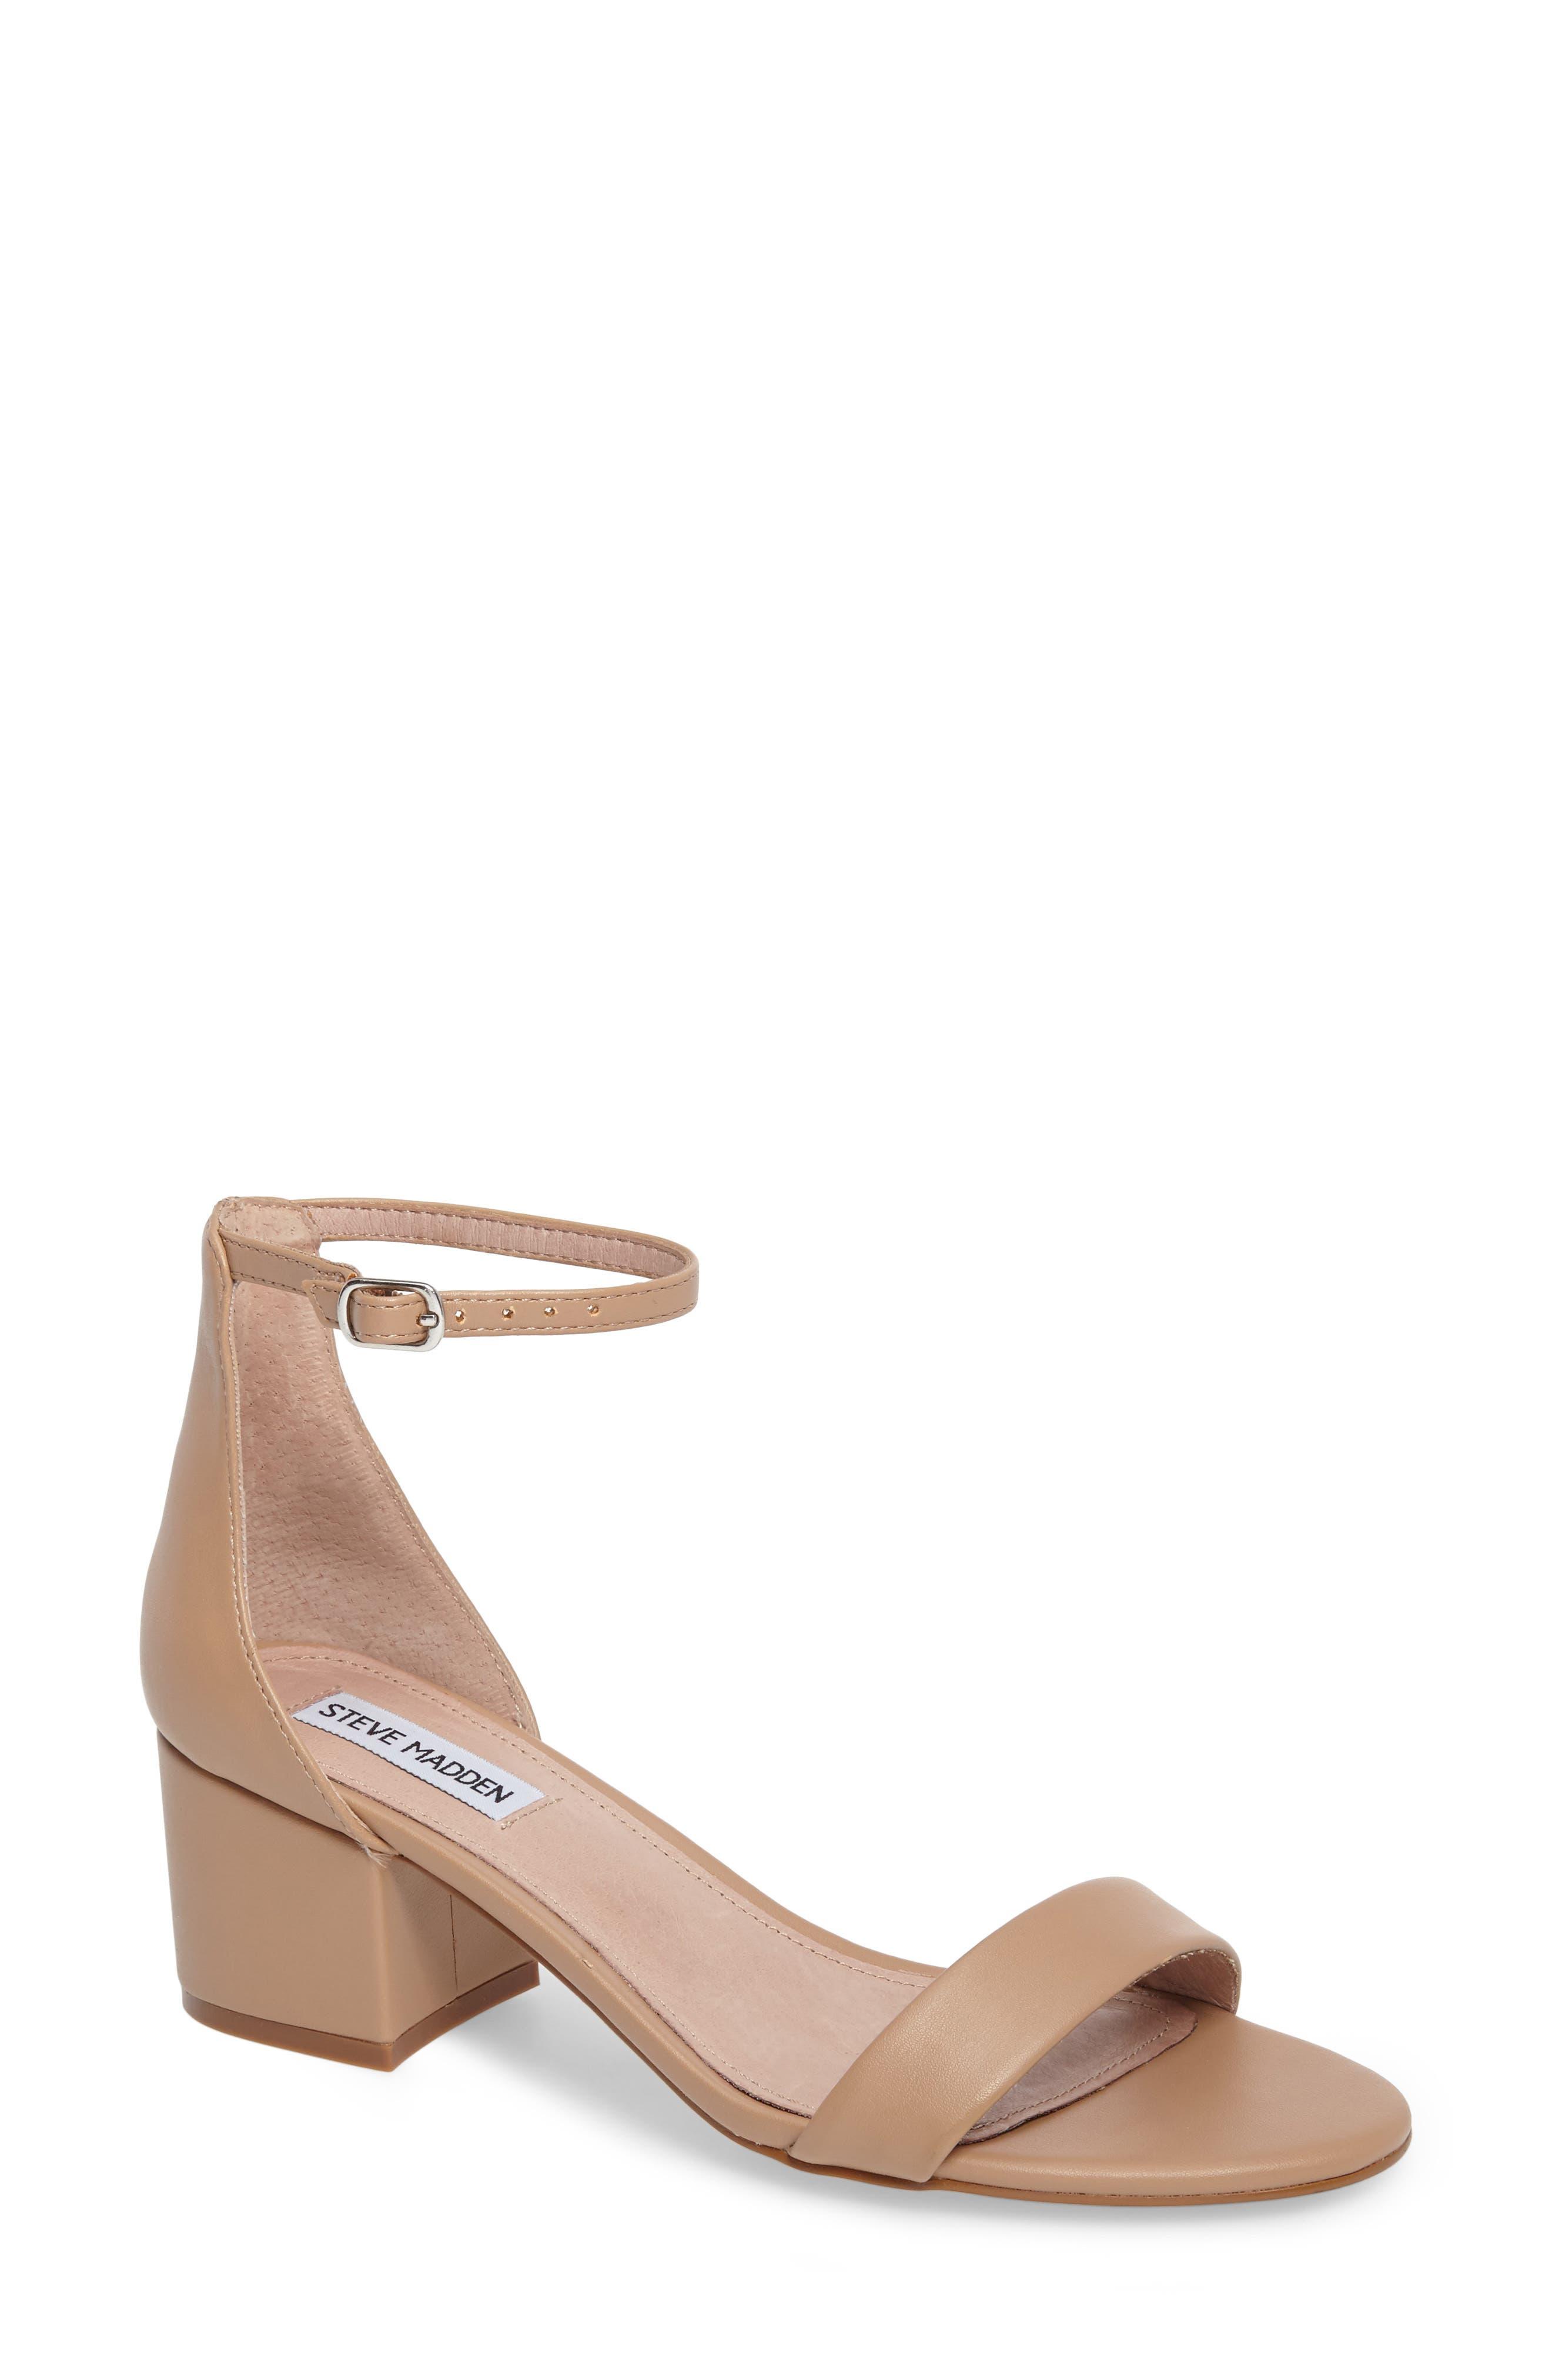 Irenee Ankle Strap Sandal,                             Main thumbnail 6, color,